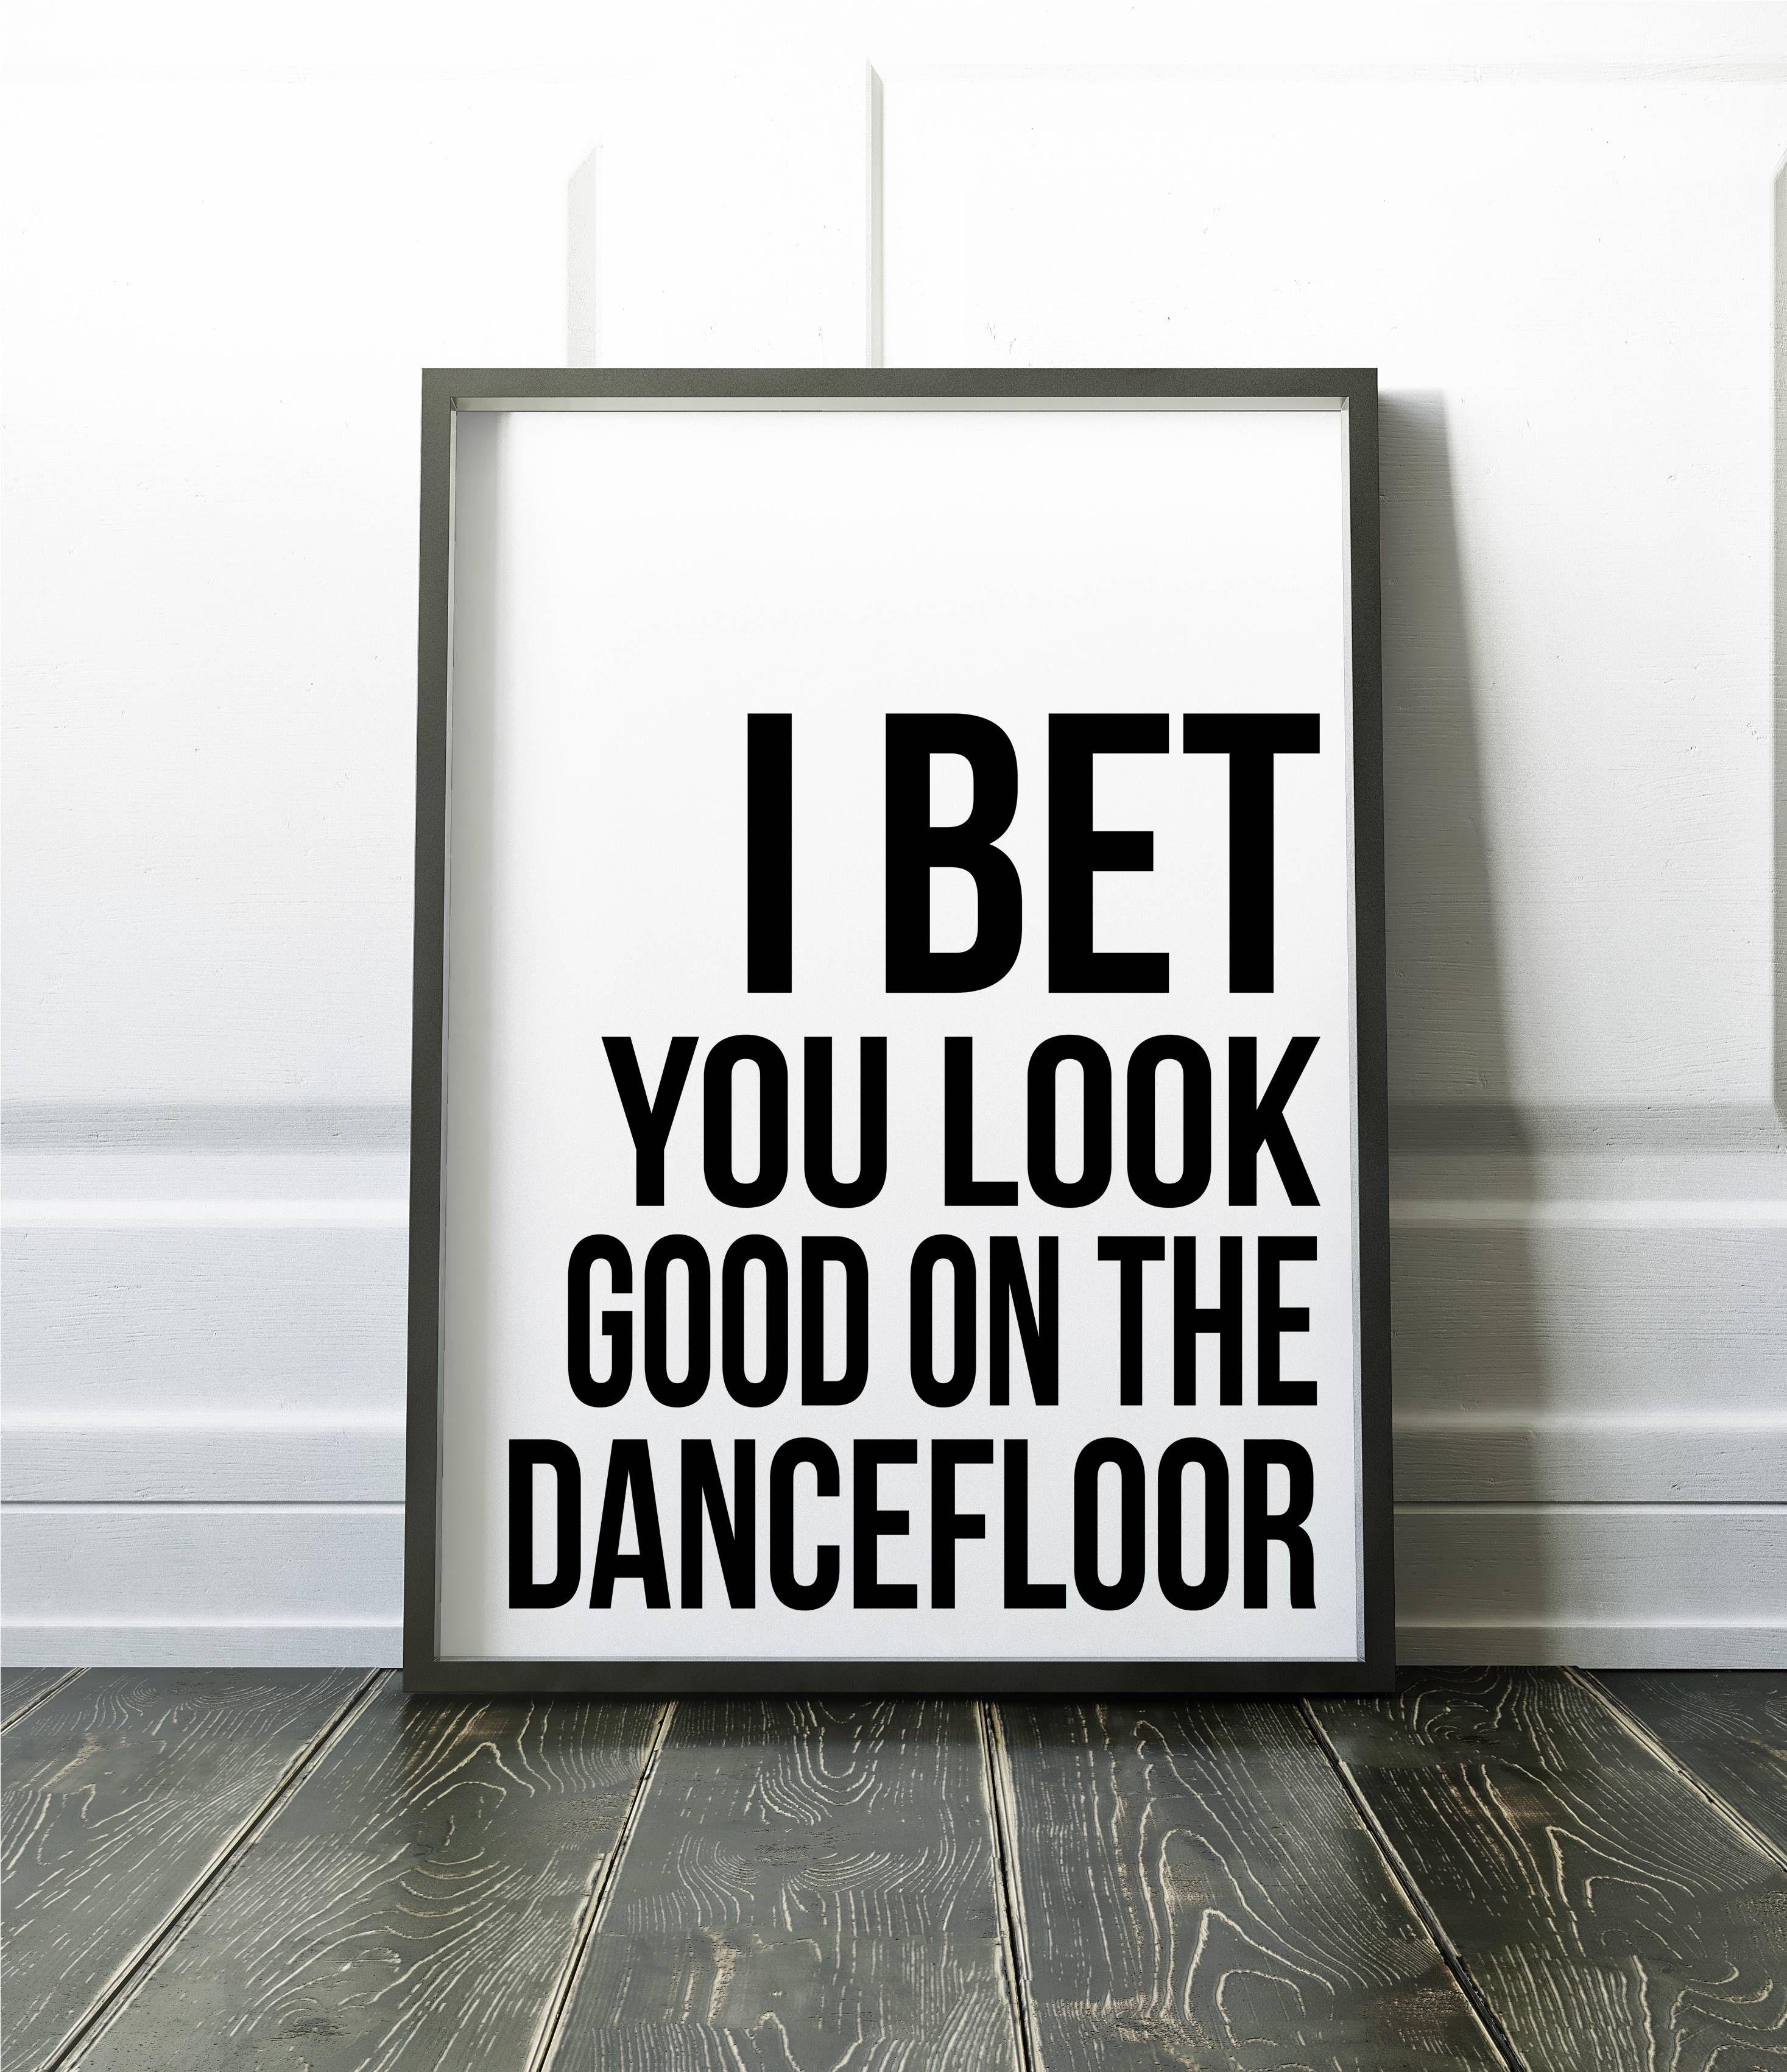 Home Design Ideas Buch: I Bet You Look Good On The Dancefloor, Wedding Sign